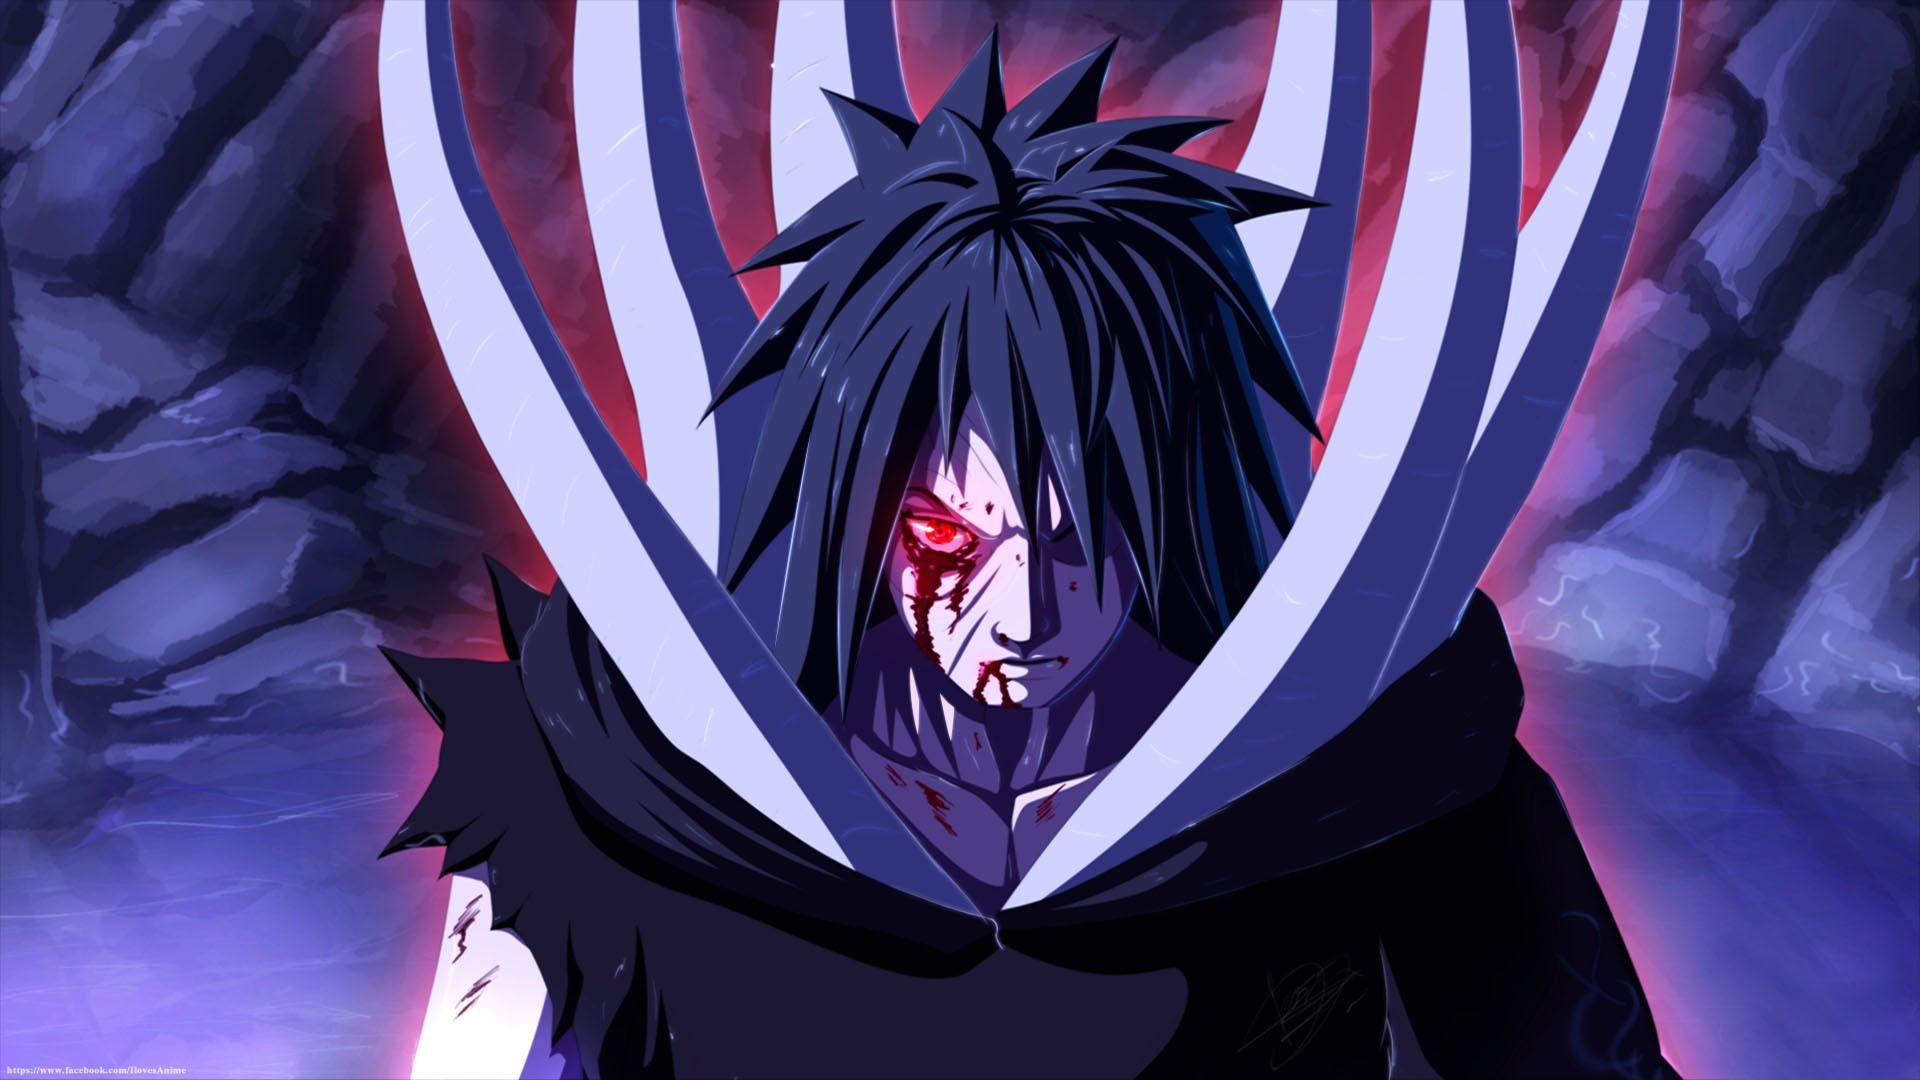 1920x1080 Naruto Storm 4 Gameplay Kakashi Six Paths Madara Obito Vs Rinne Sharingan Sasuke